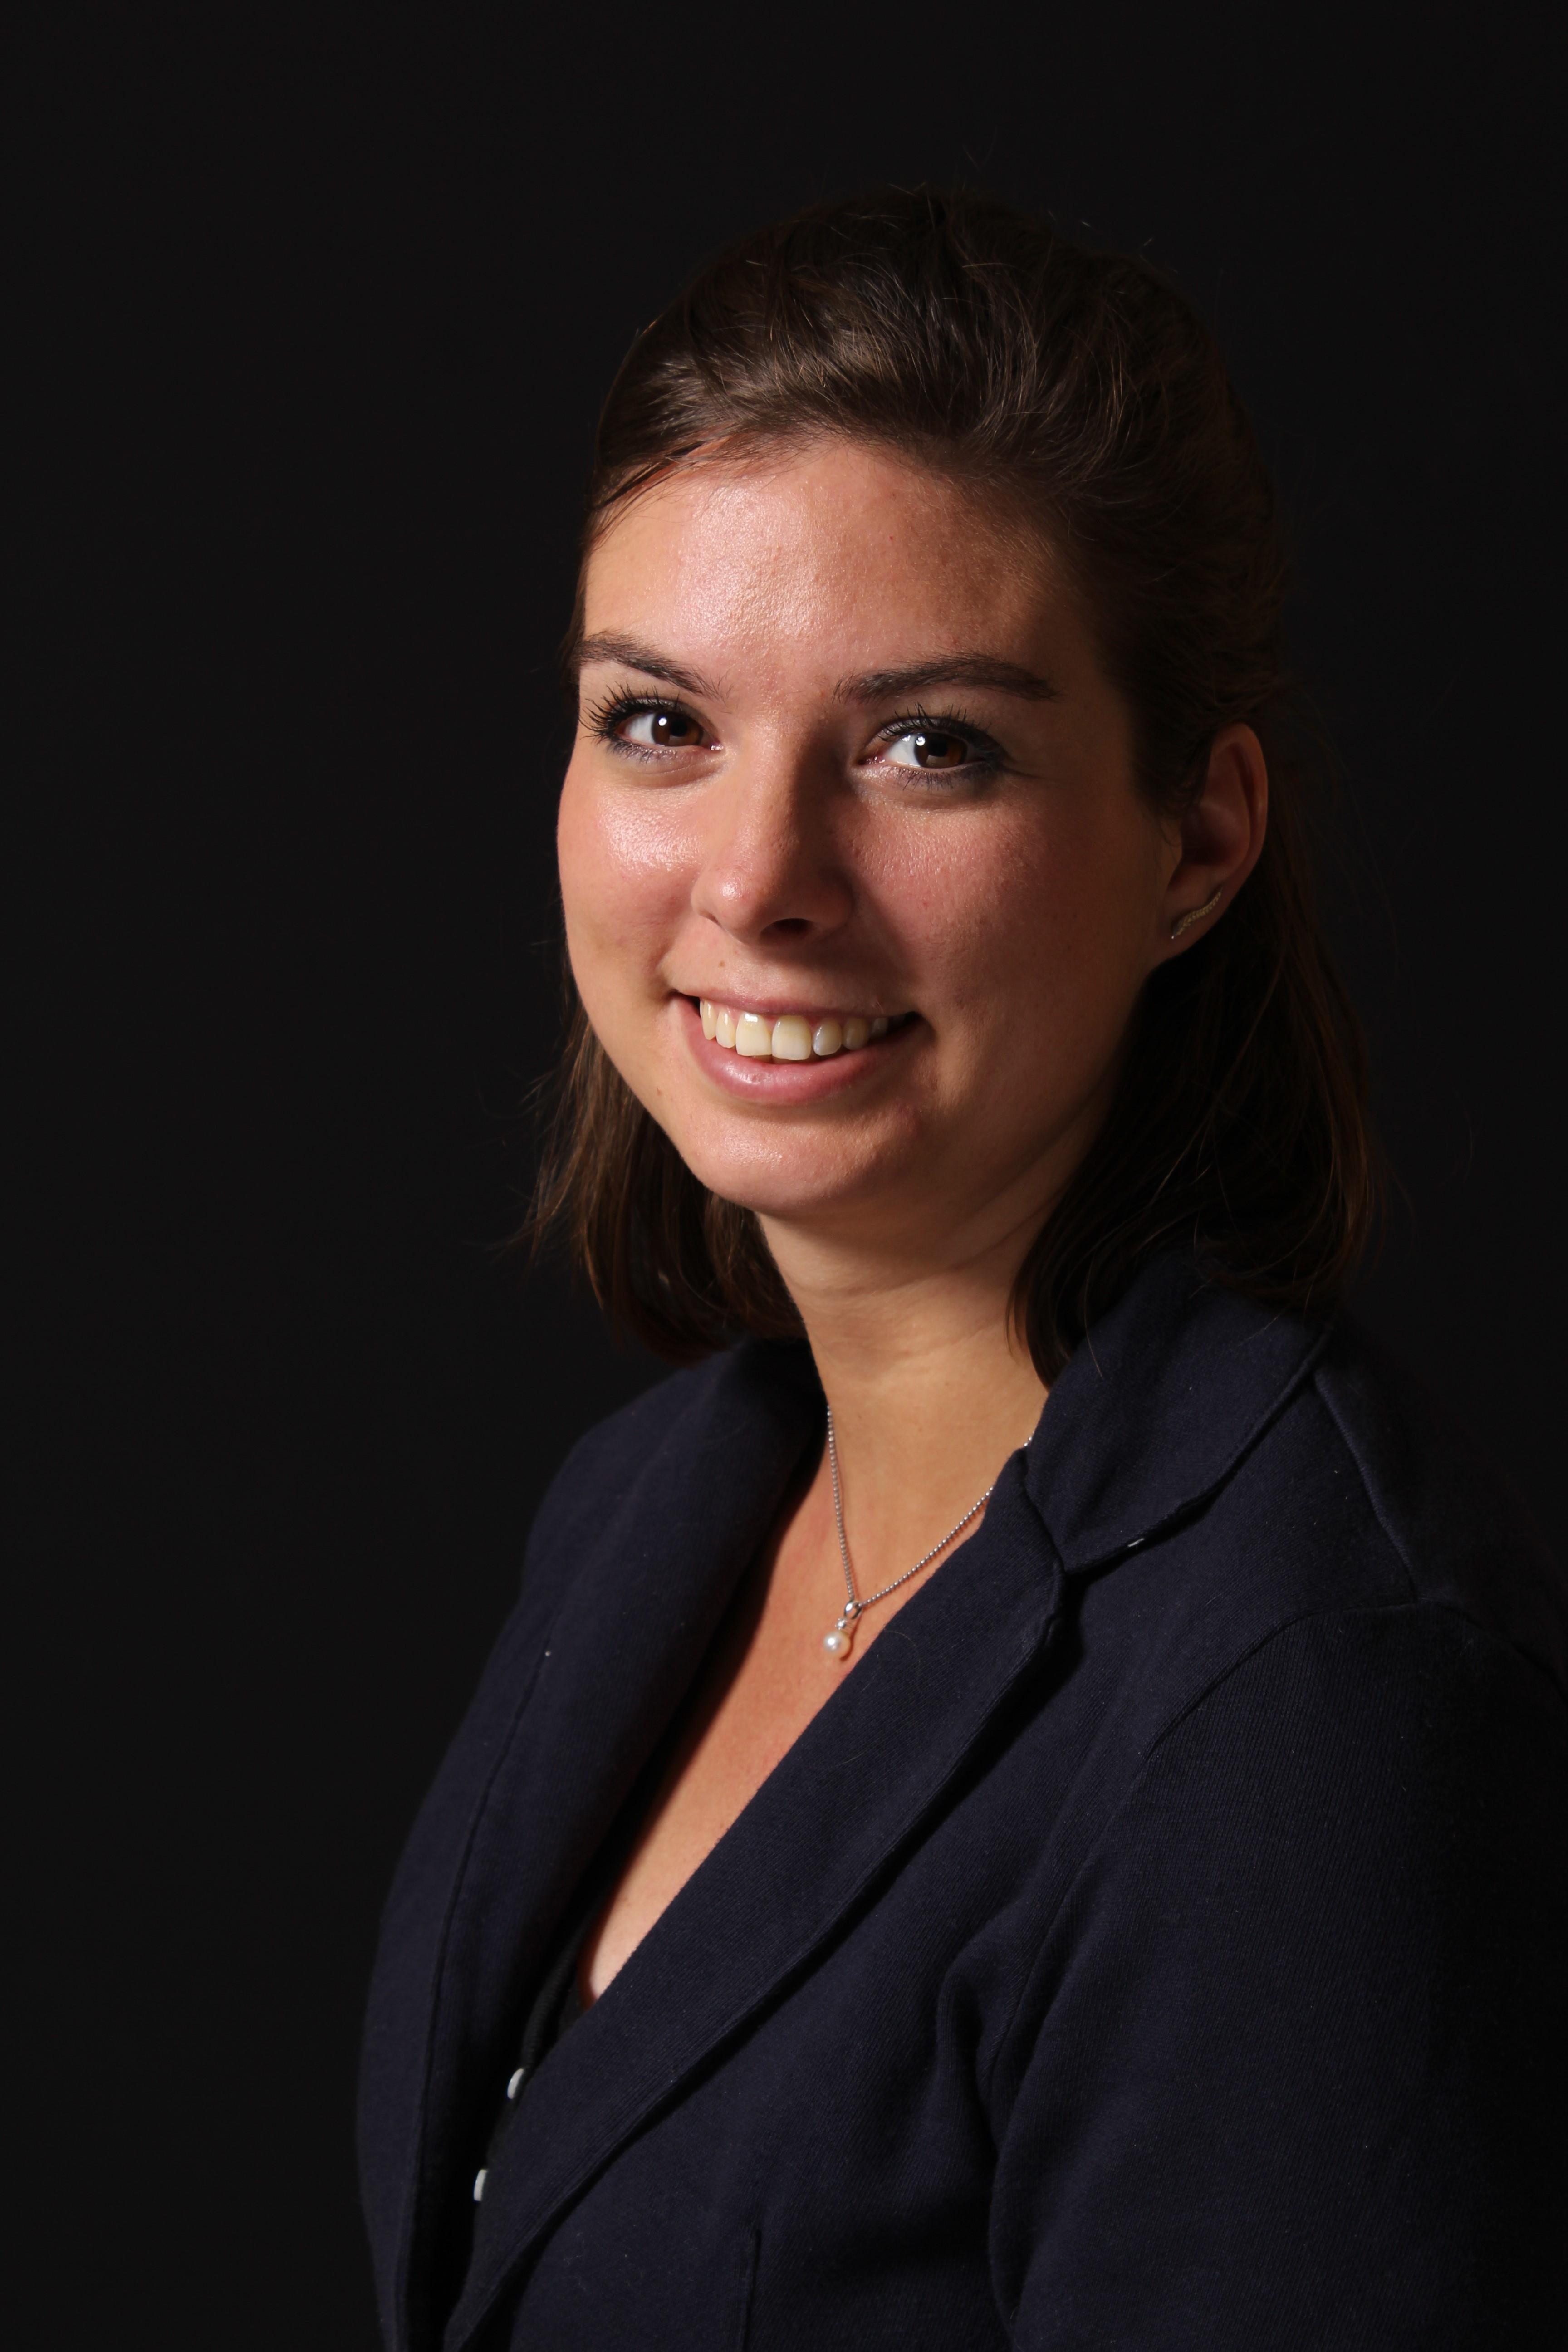 Caroline Bruikman, MSc, MD